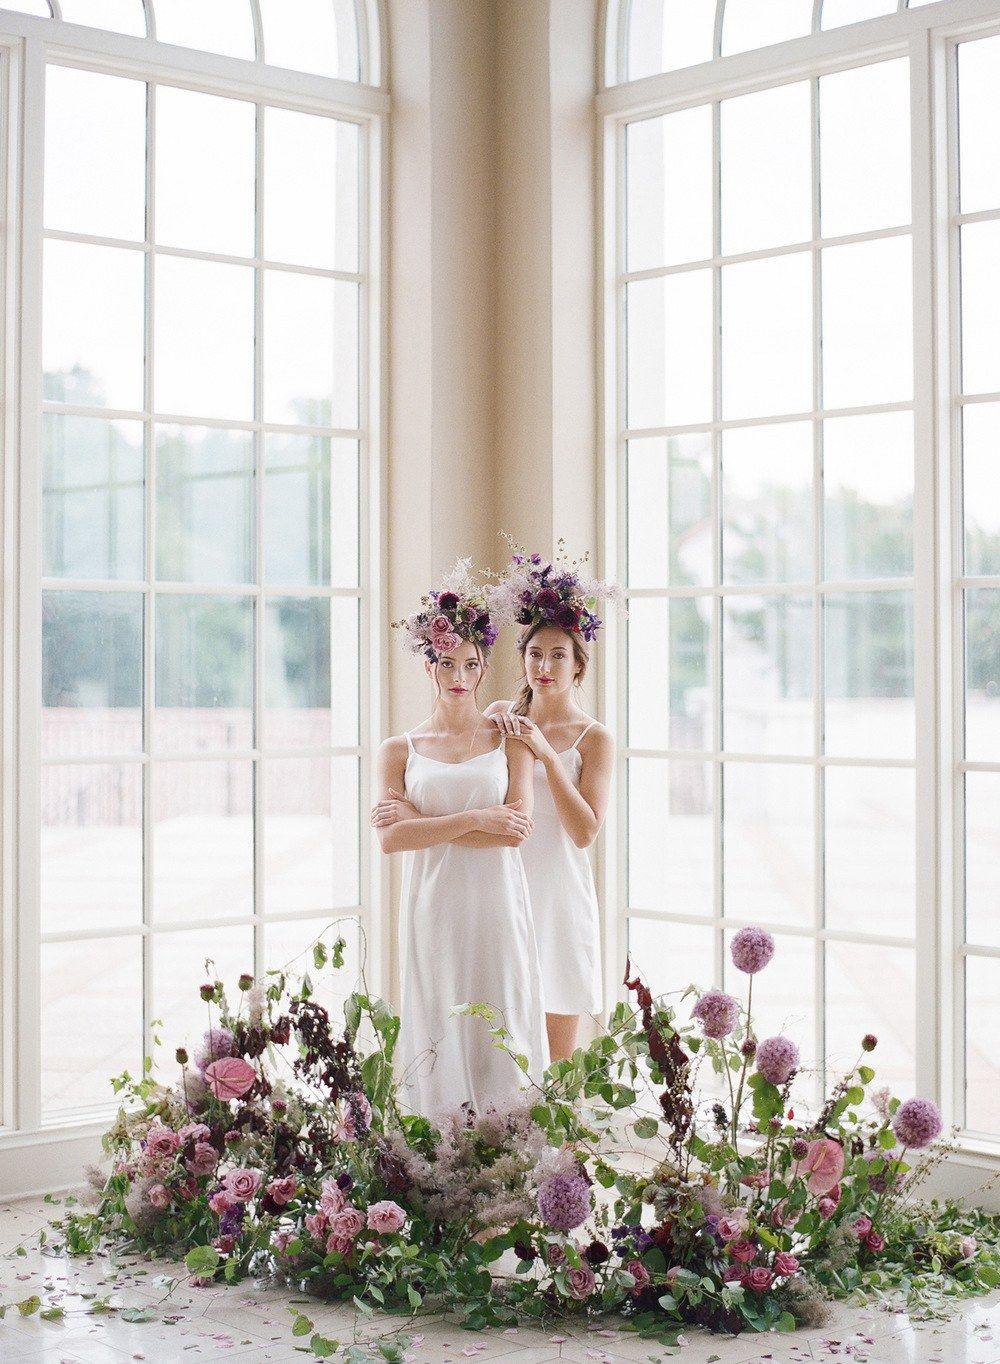 Feminine french bridal fashion shoot wedding inspiration